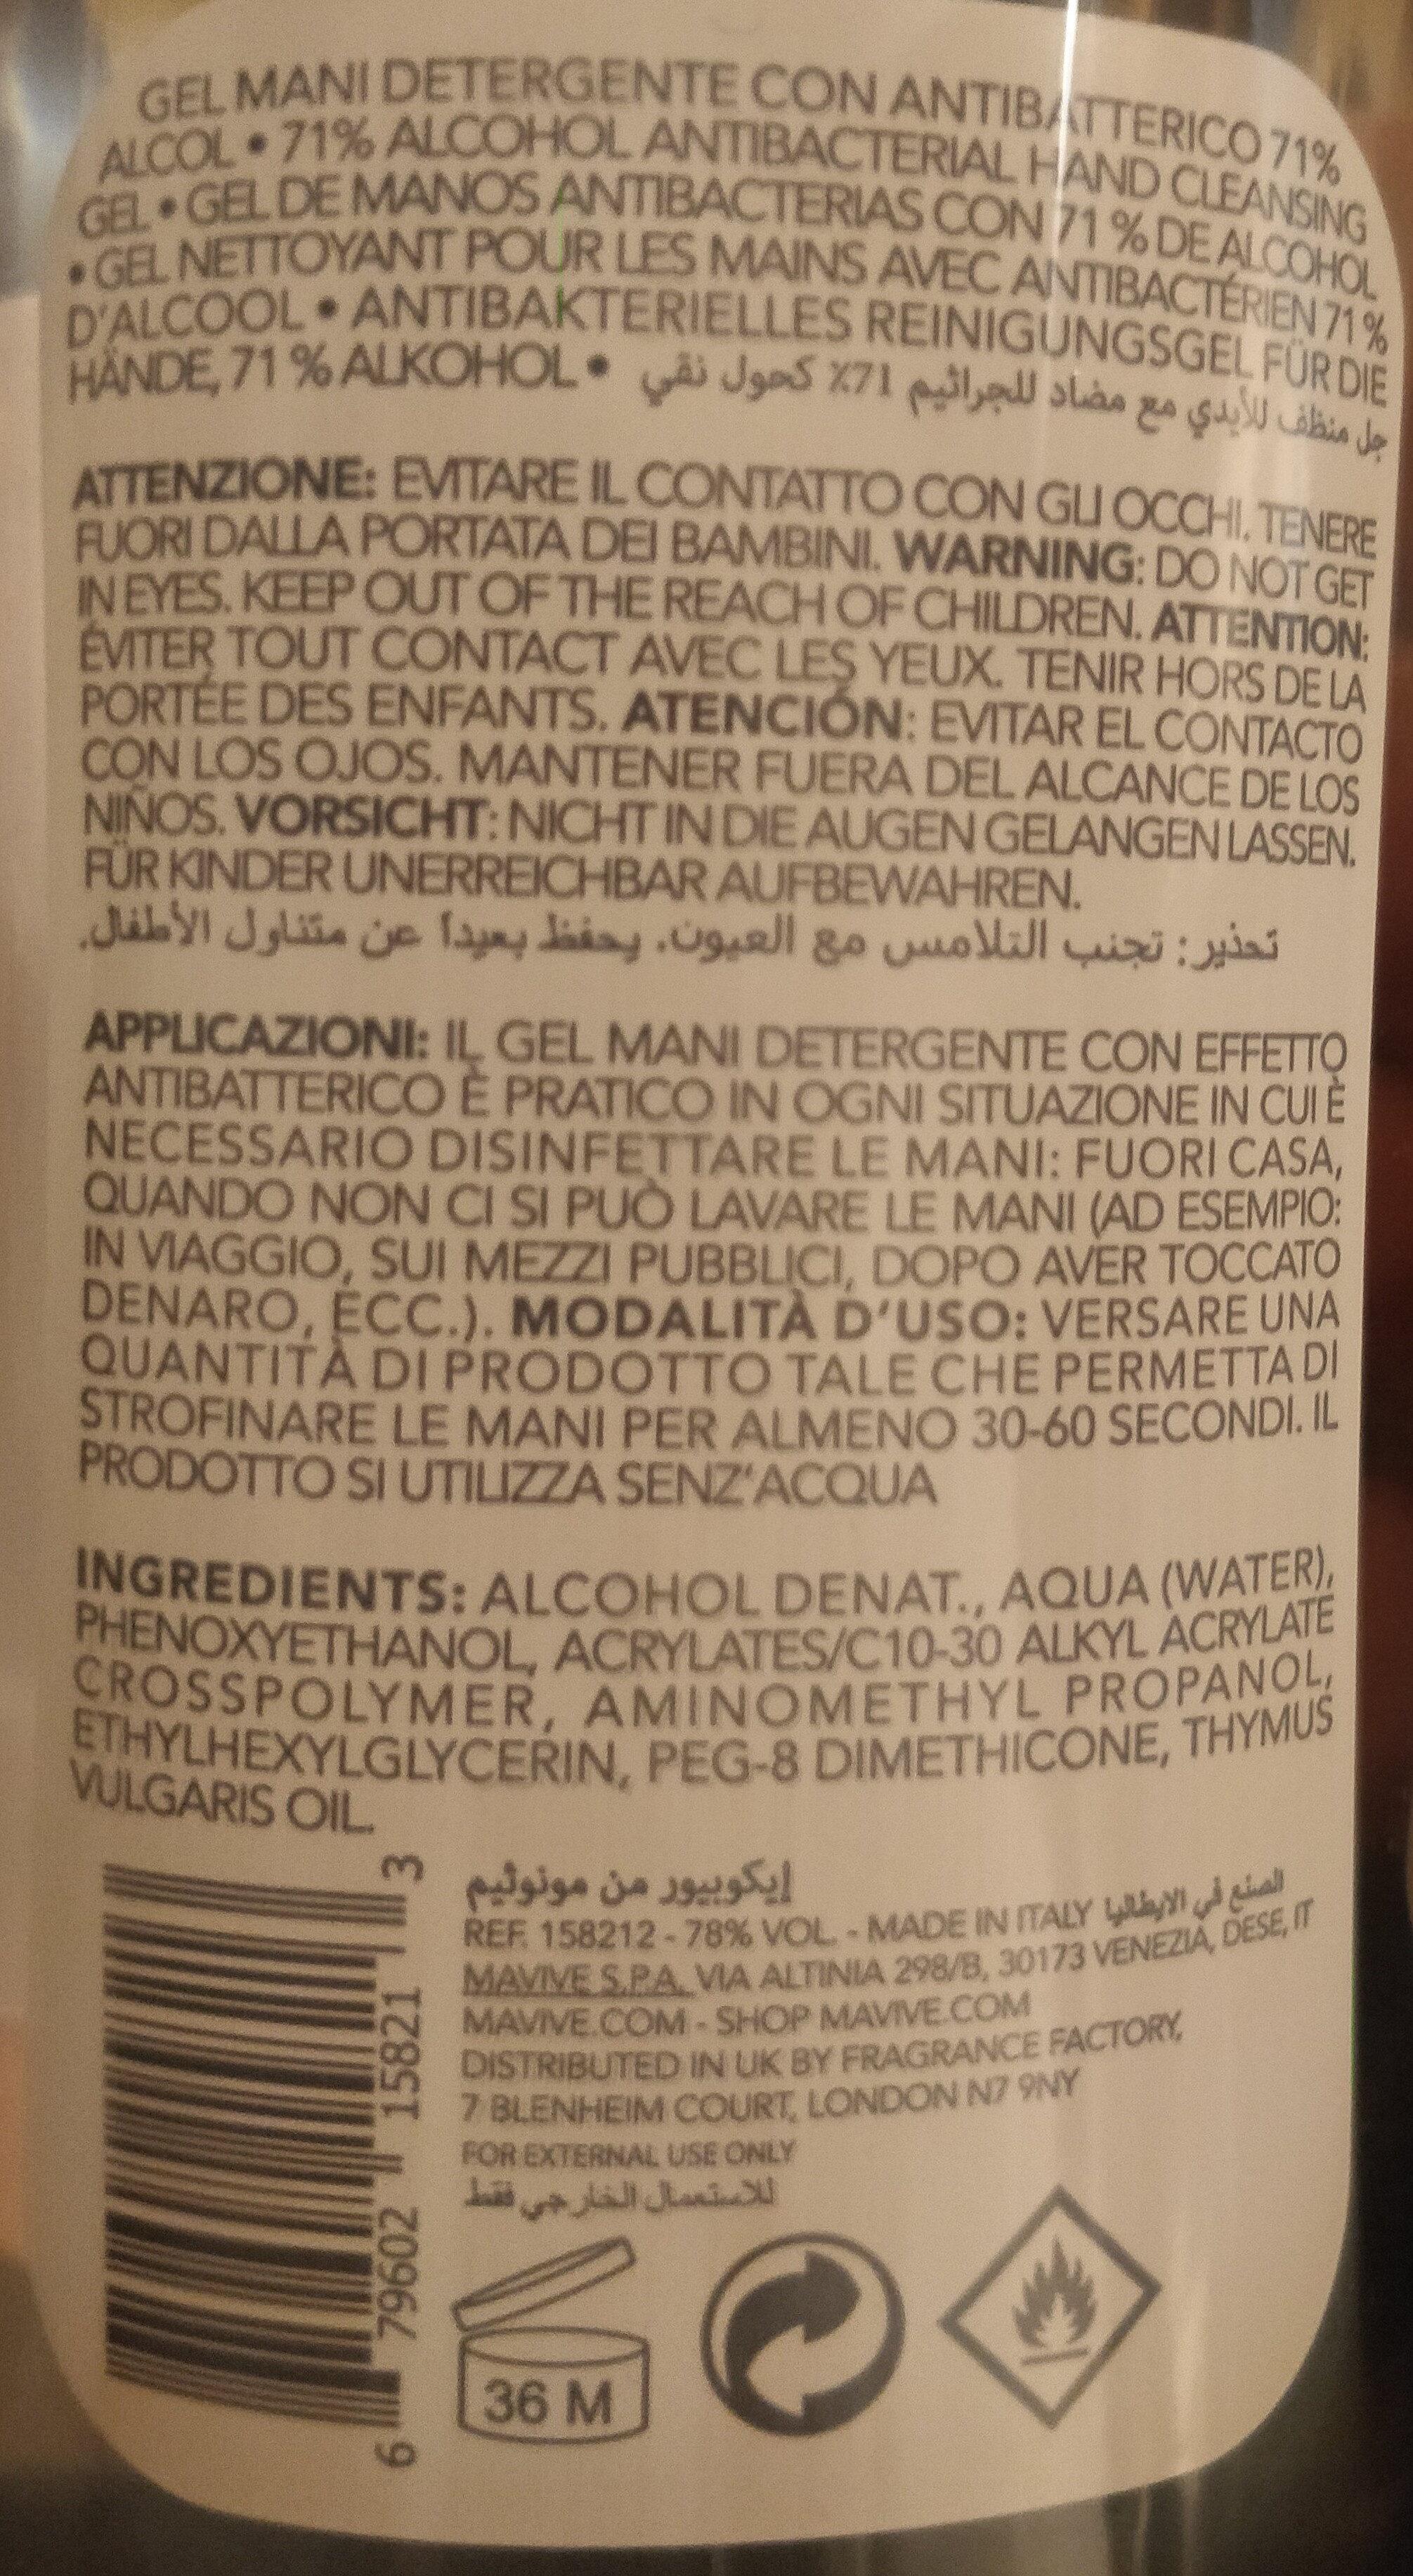 Gel mani detergente con antibatterico 71% alcool - Product - en